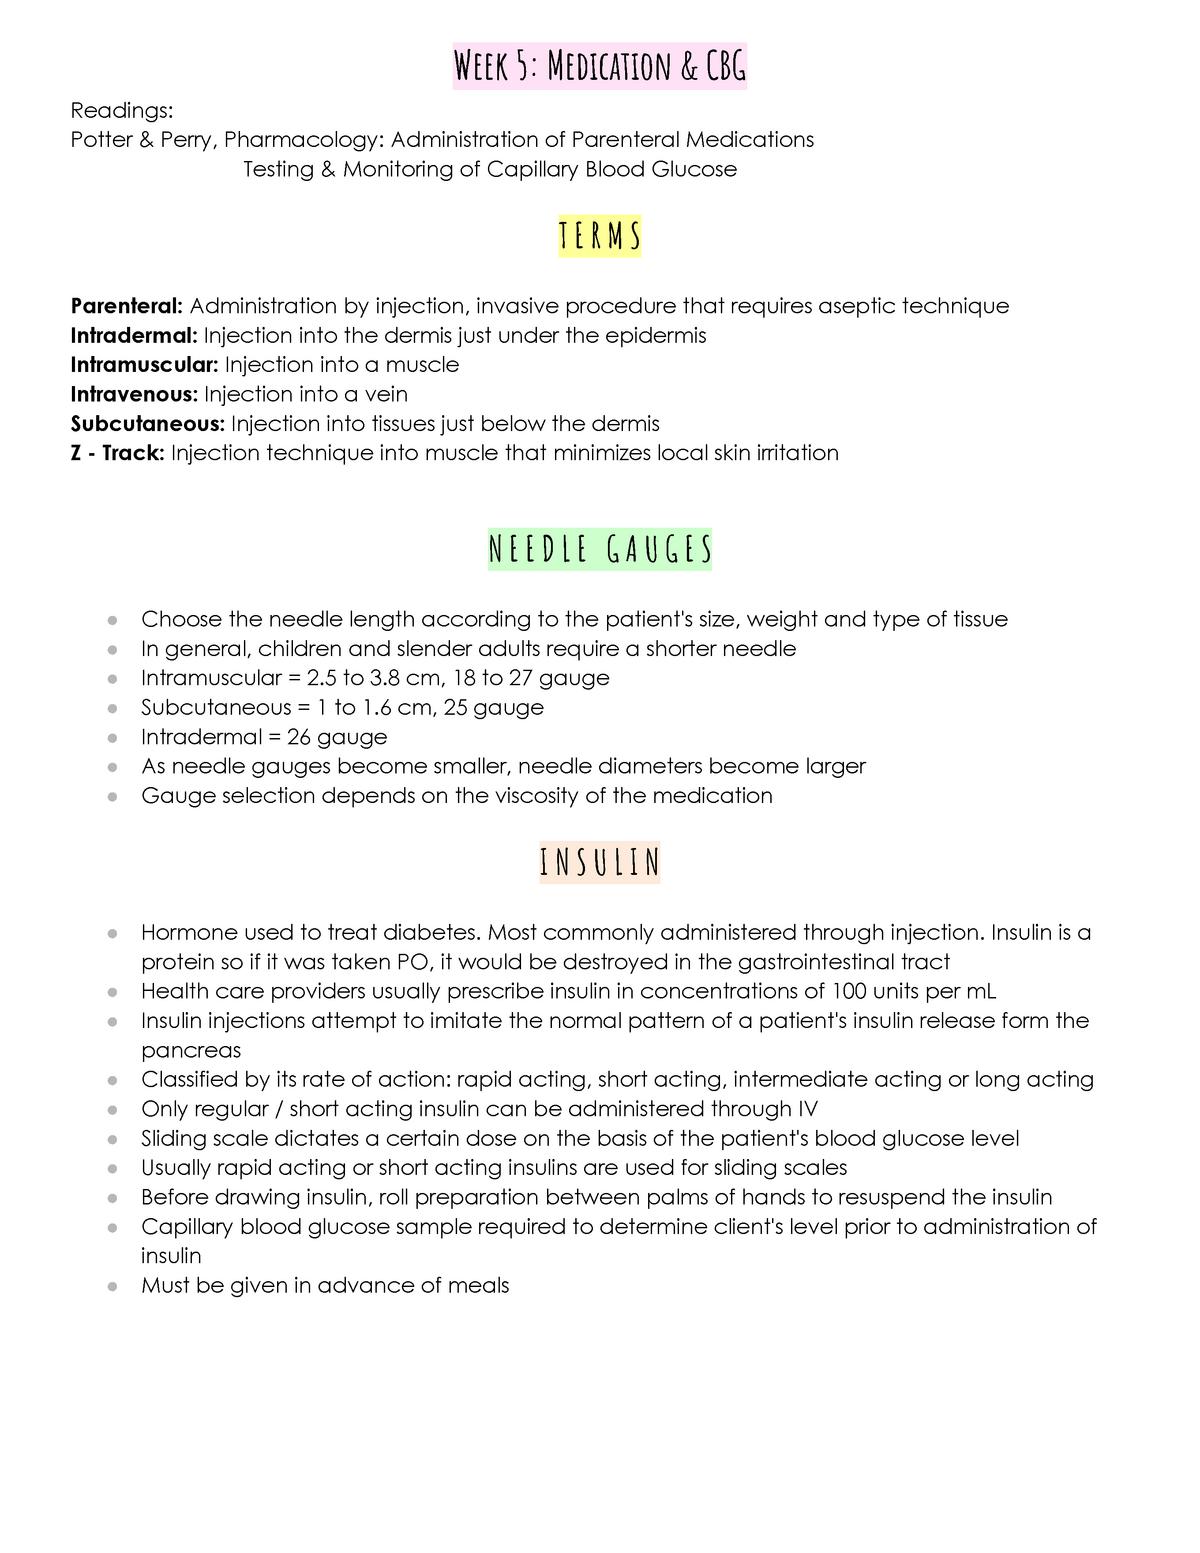 Week 5 Medication & CBG - Lecture notes Week 5 - NRSG-10064